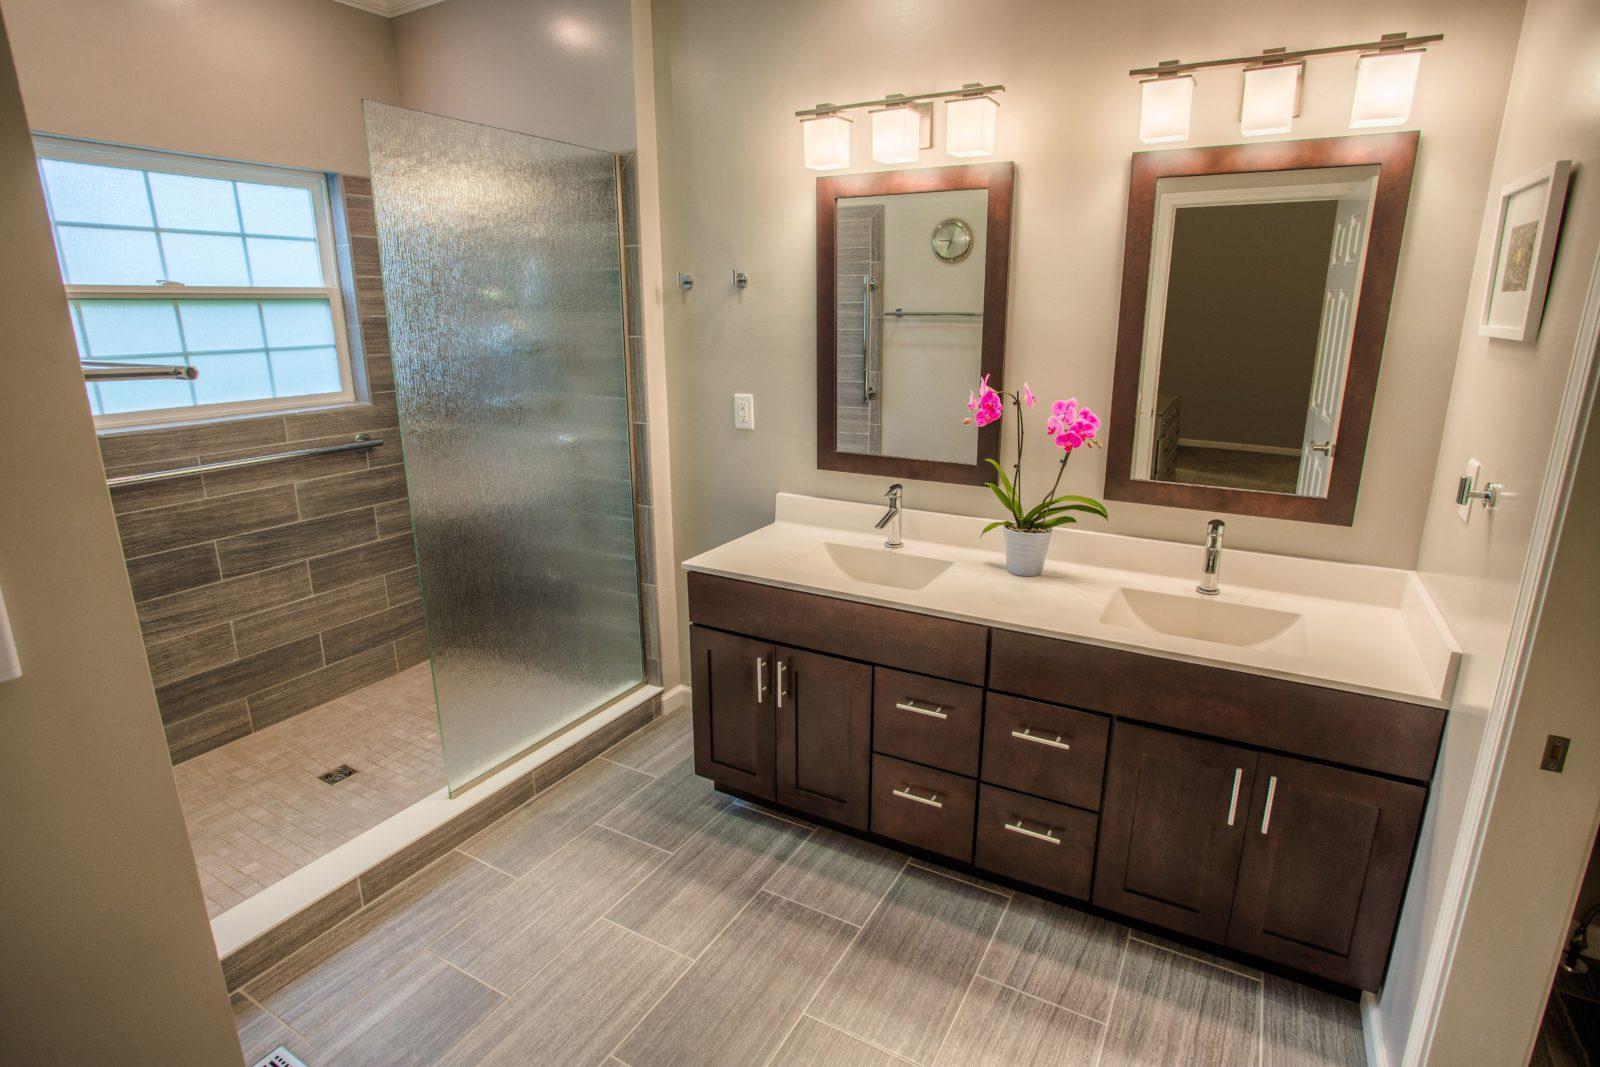 West Lafayette Contemporary Master Bathroom Remodel ... on Restroom Renovation  id=72029